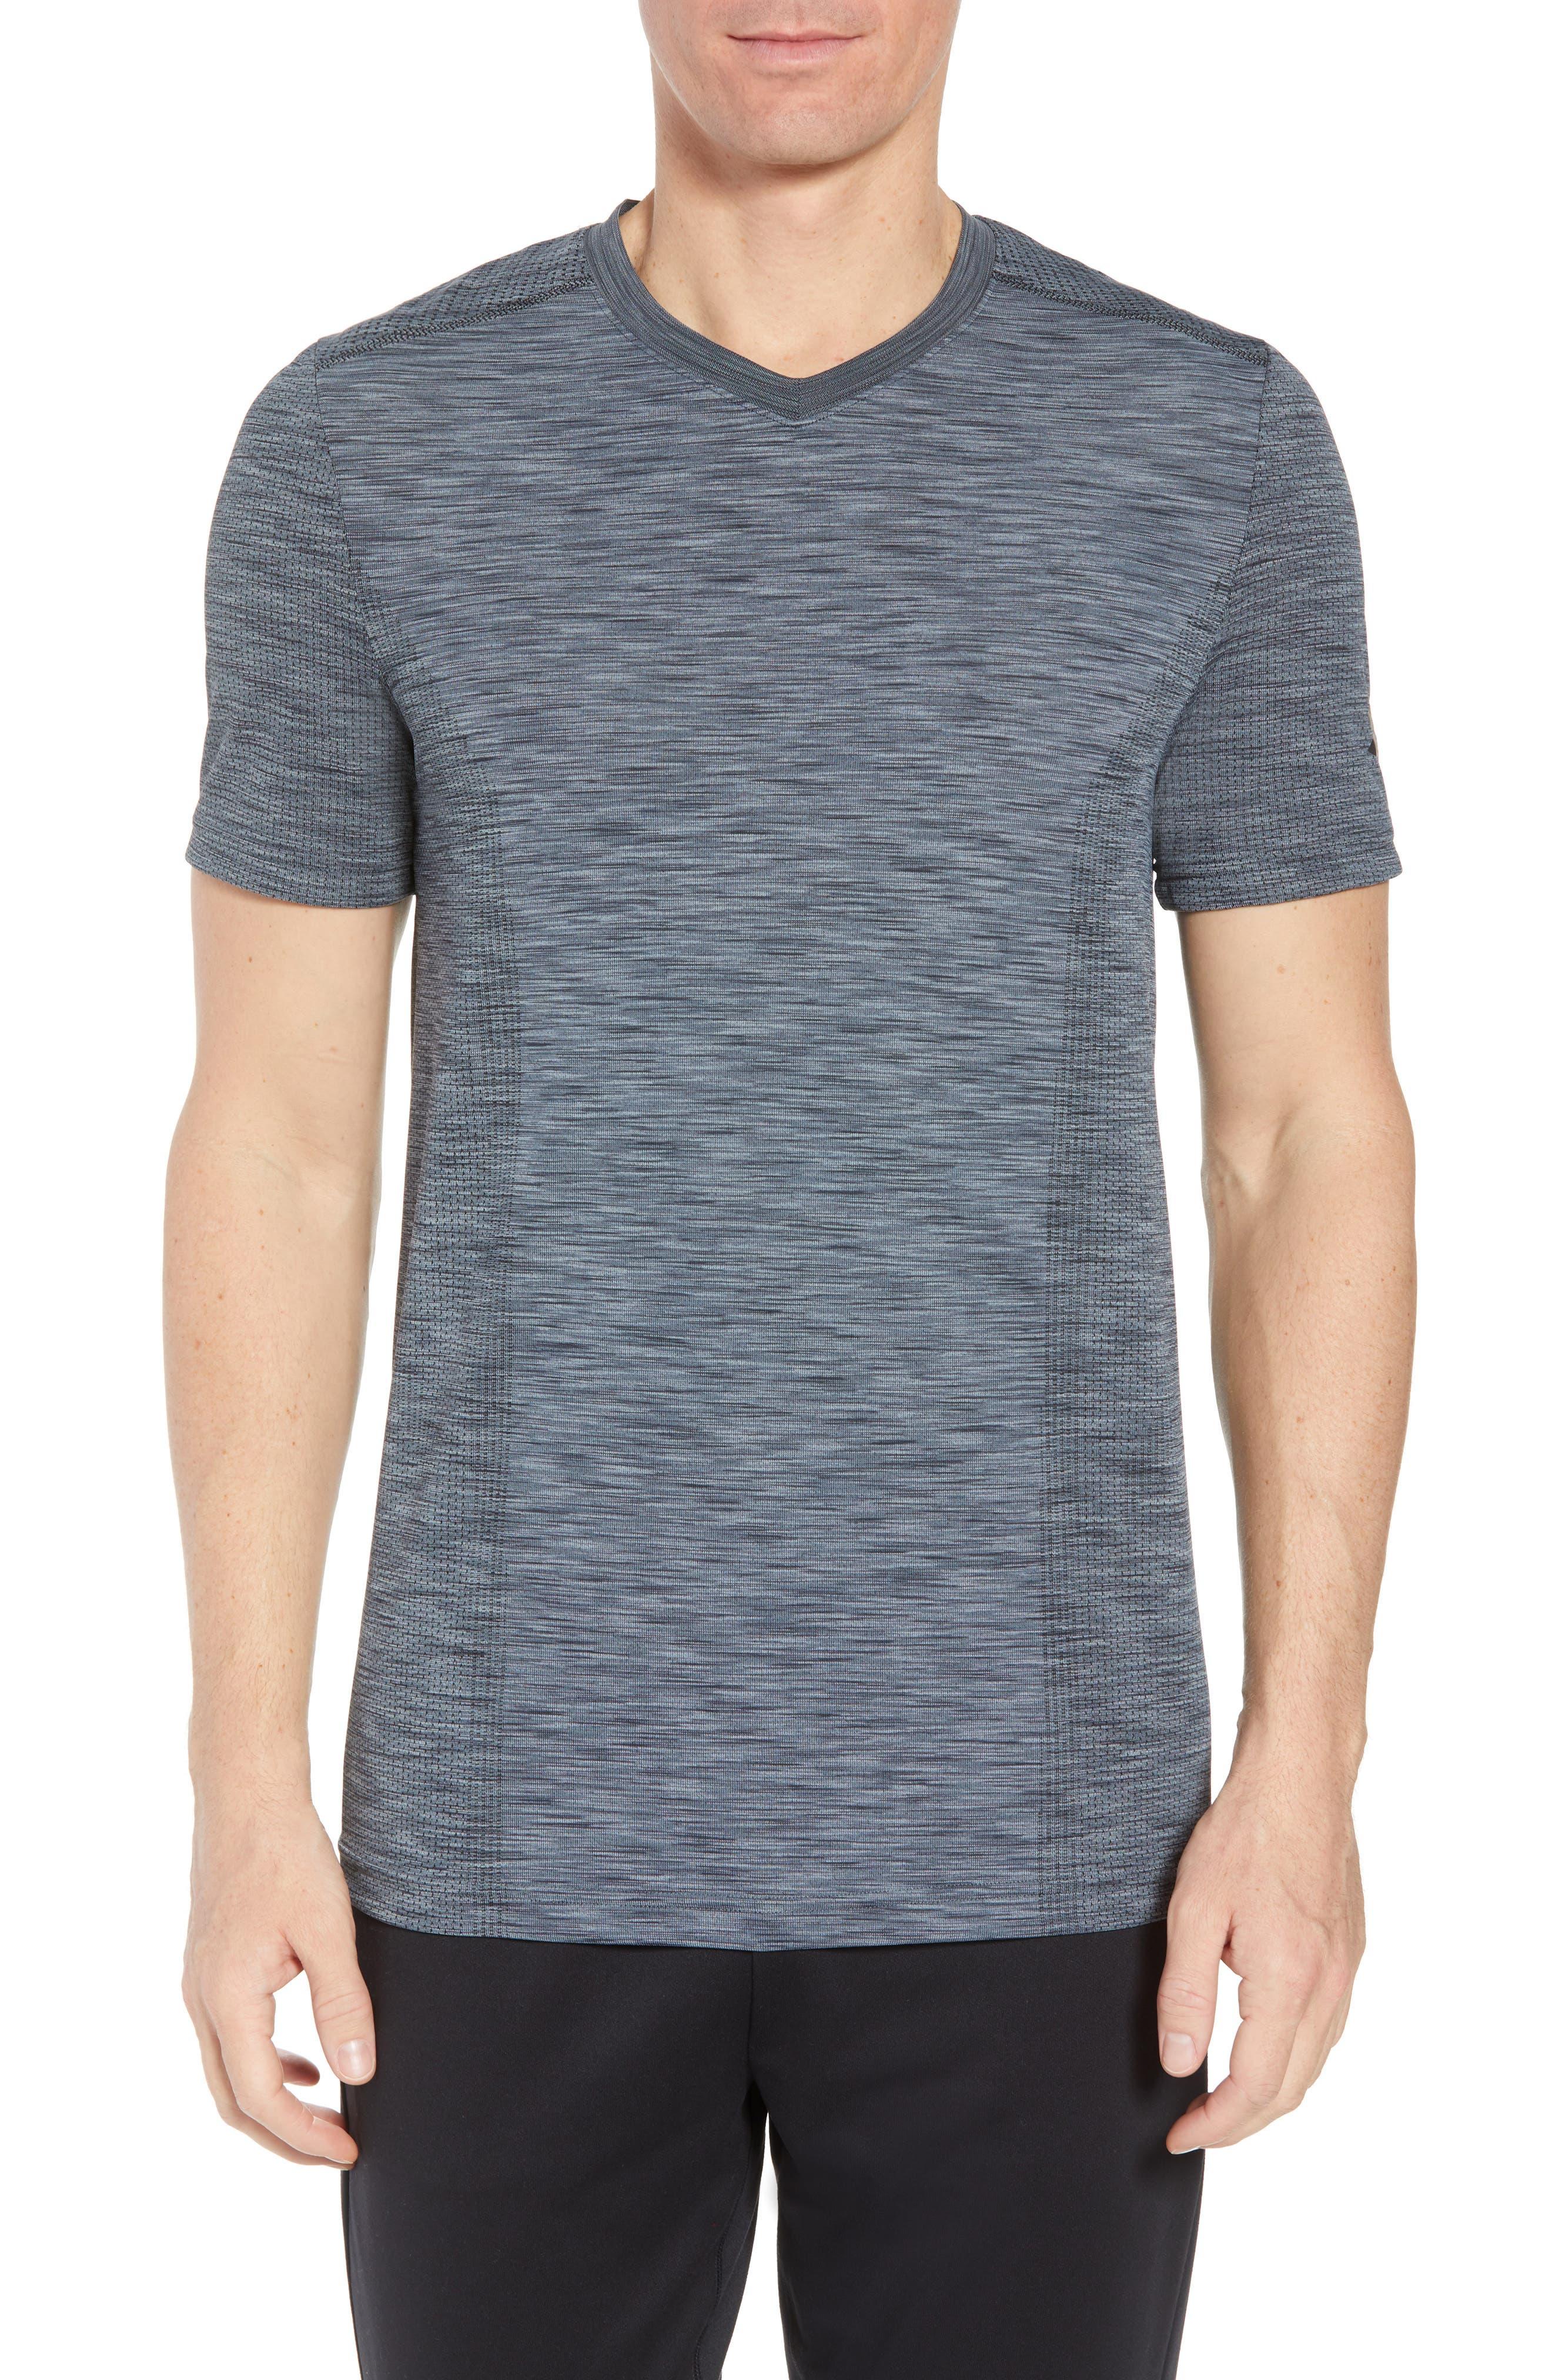 Regular Fit Threadborne T-Shirt,                         Main,                         color, GRAPHITE/ BLACK